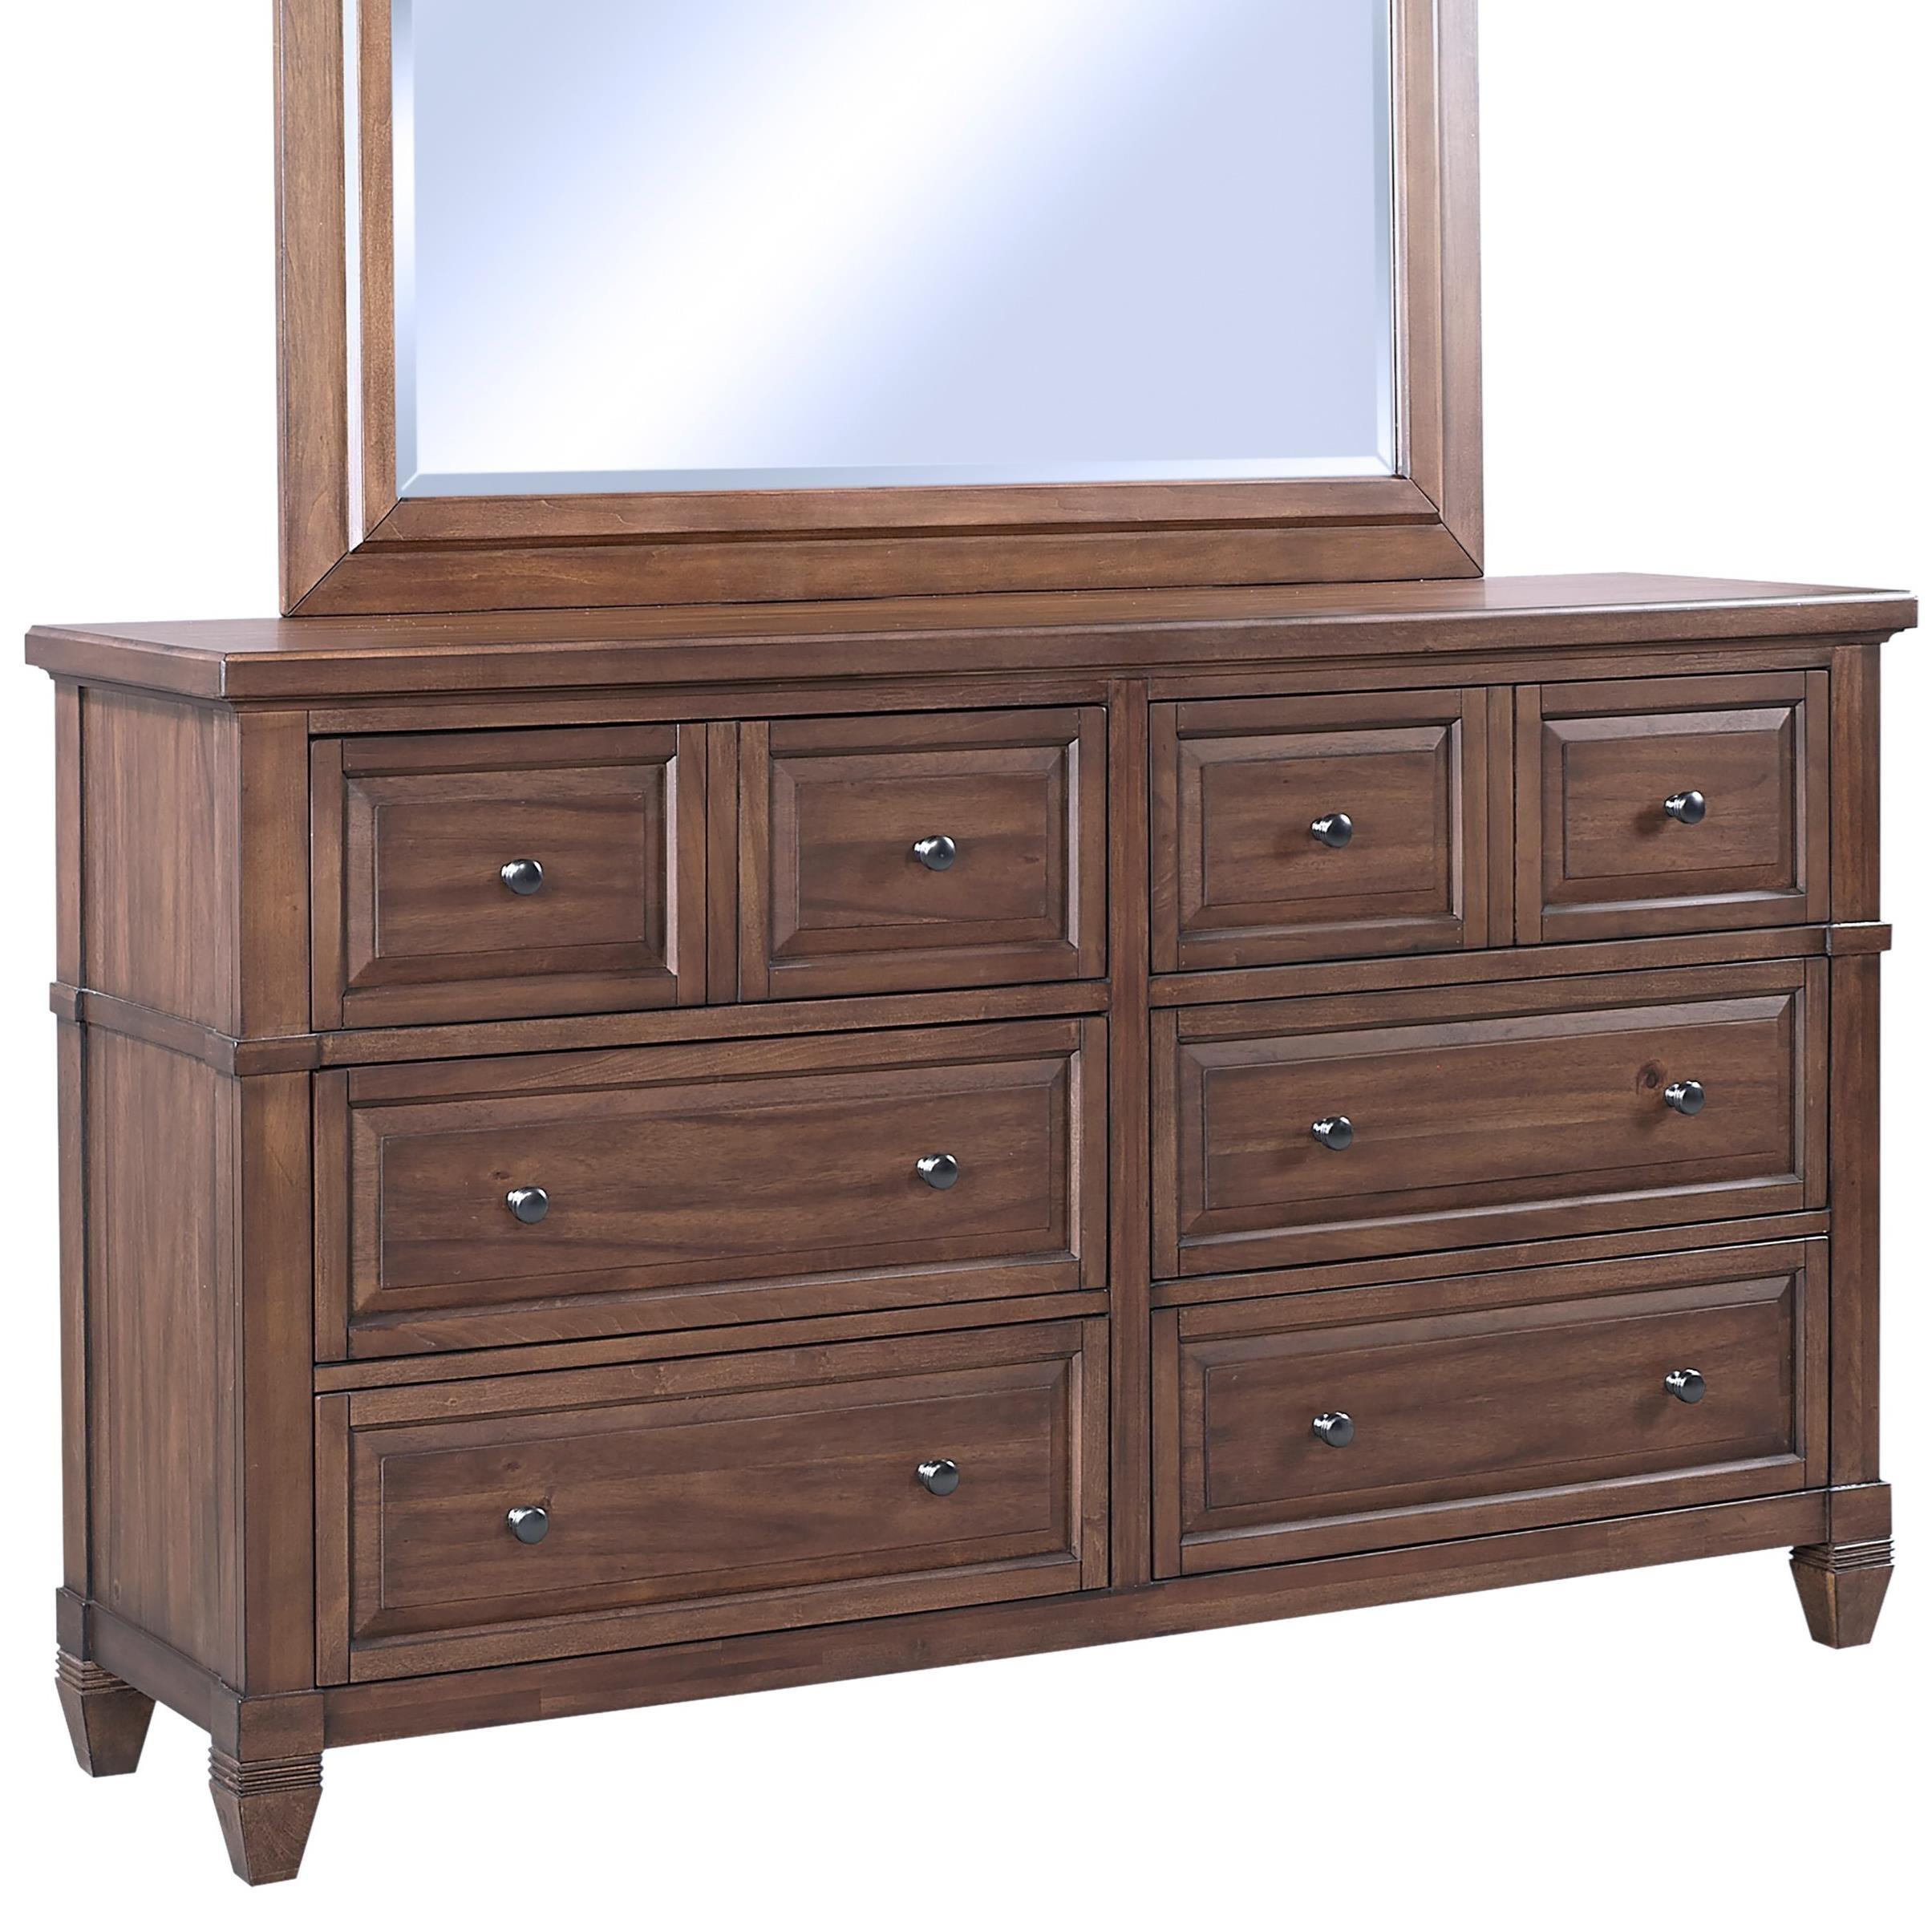 Thornton Dresser by Aspenhome at Darvin Furniture